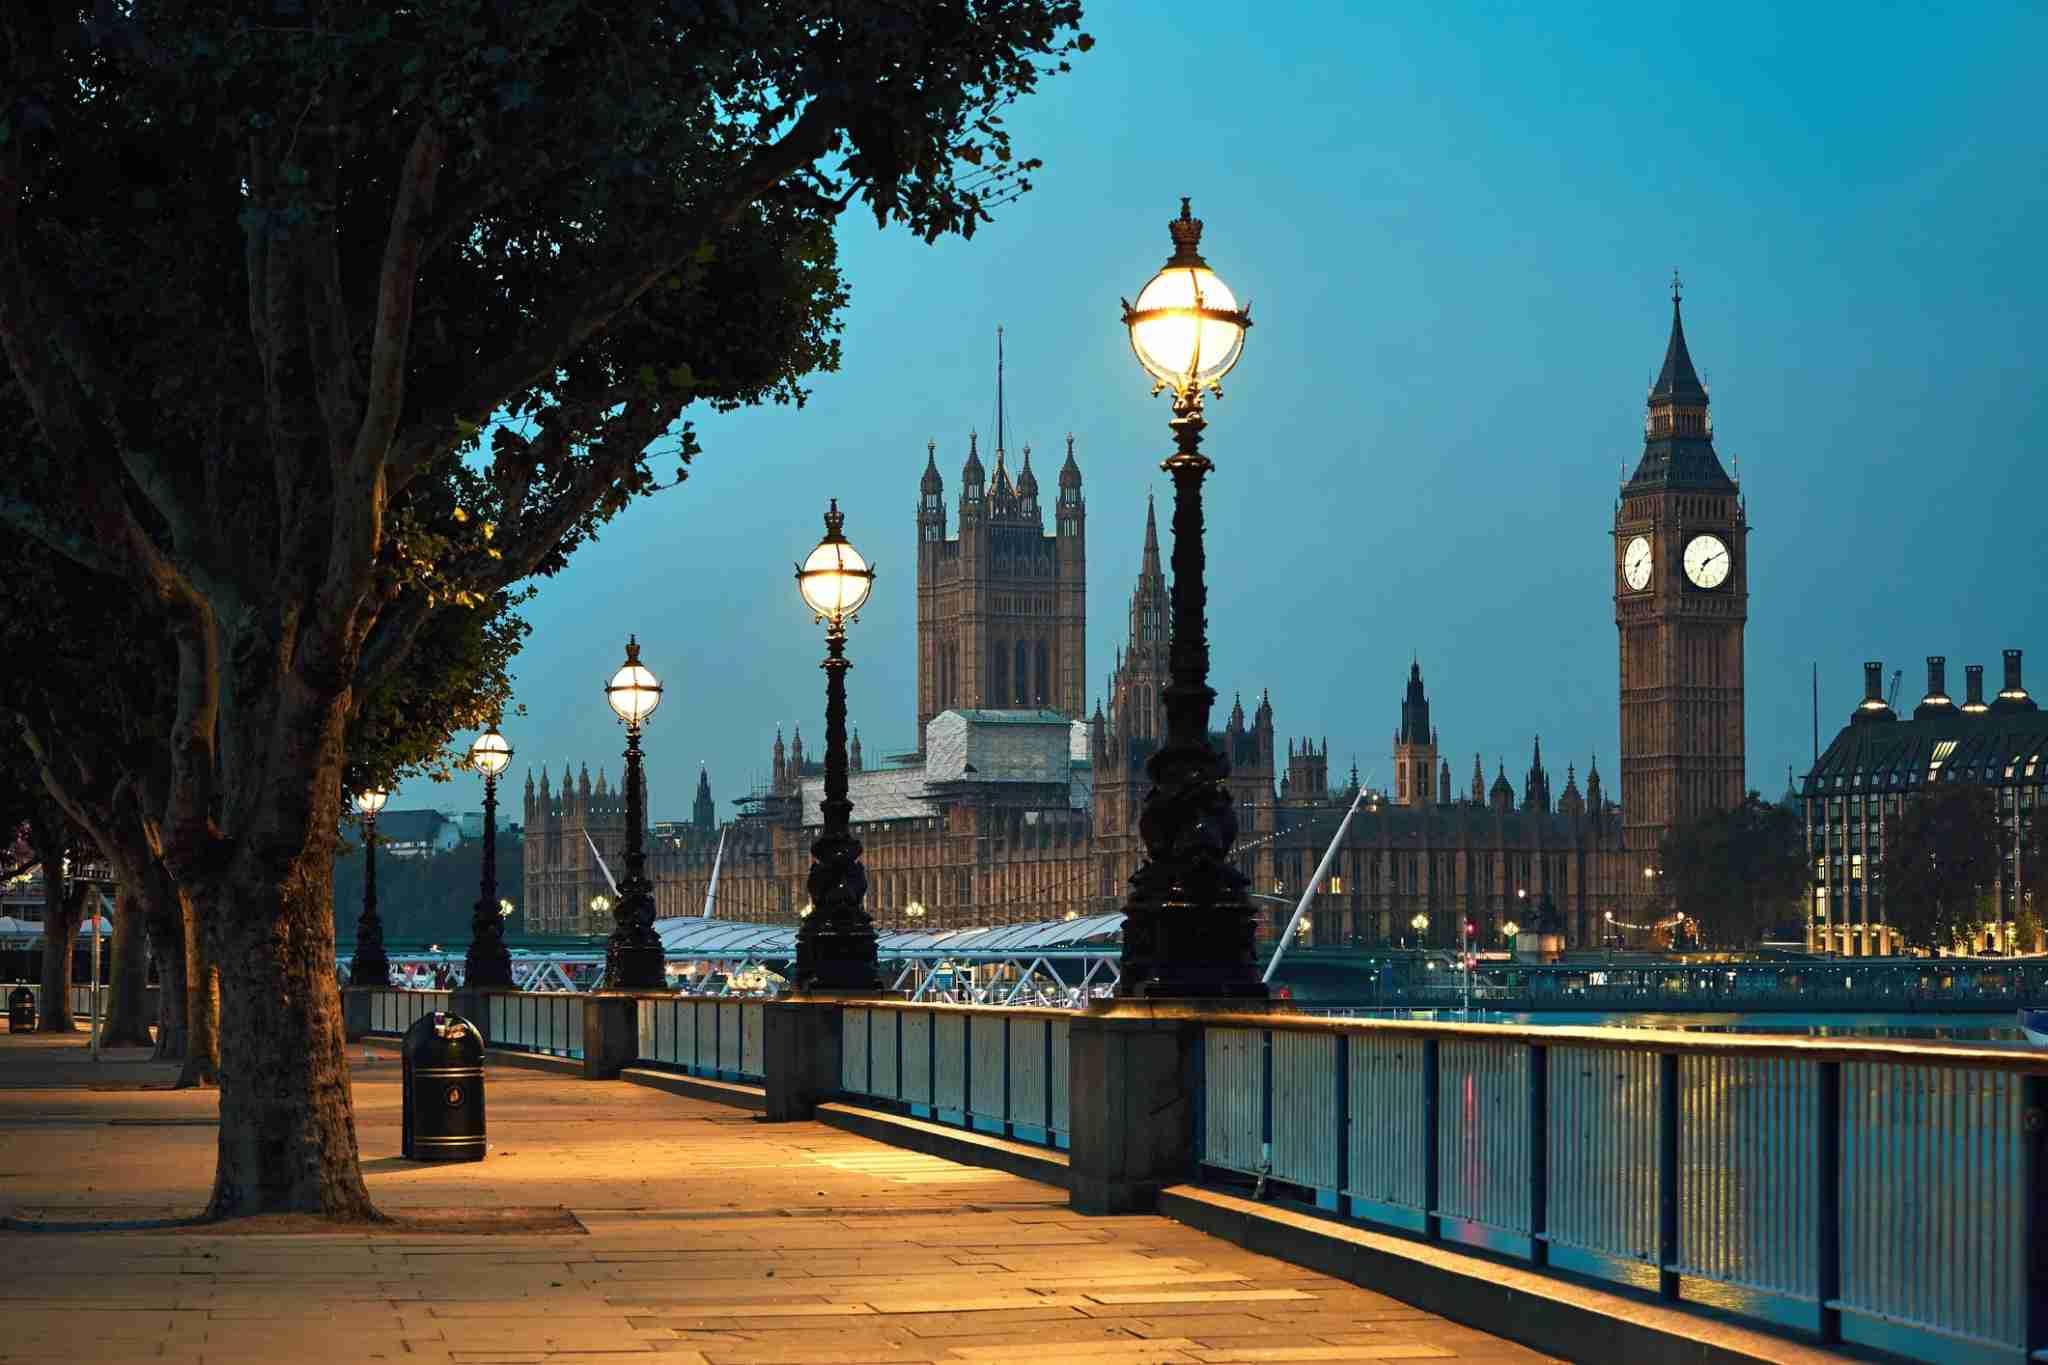 London calling. (Photo by Jaromir Chalabala / EyeEm / Getty Images)